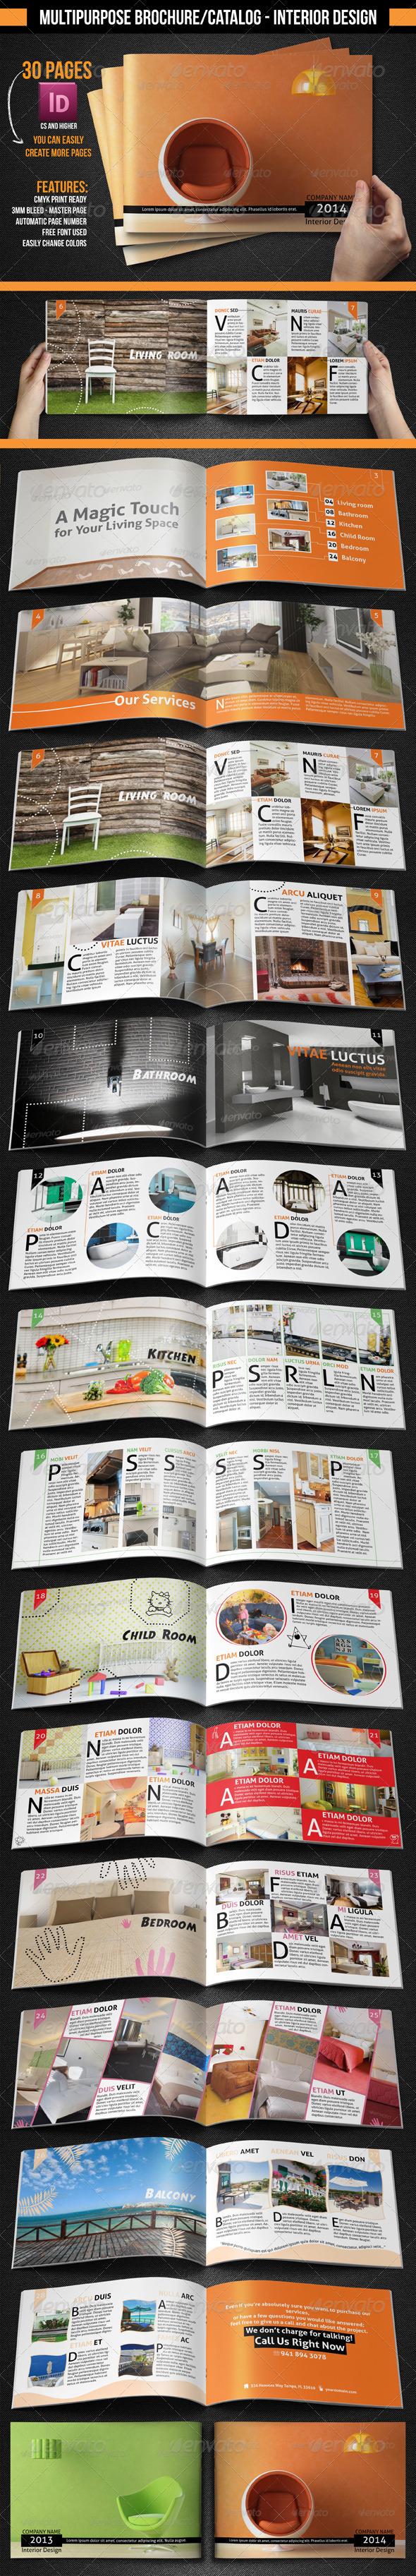 Multipurpose Brochure/Catalogue - Interior Design  - Brochures Print Templates